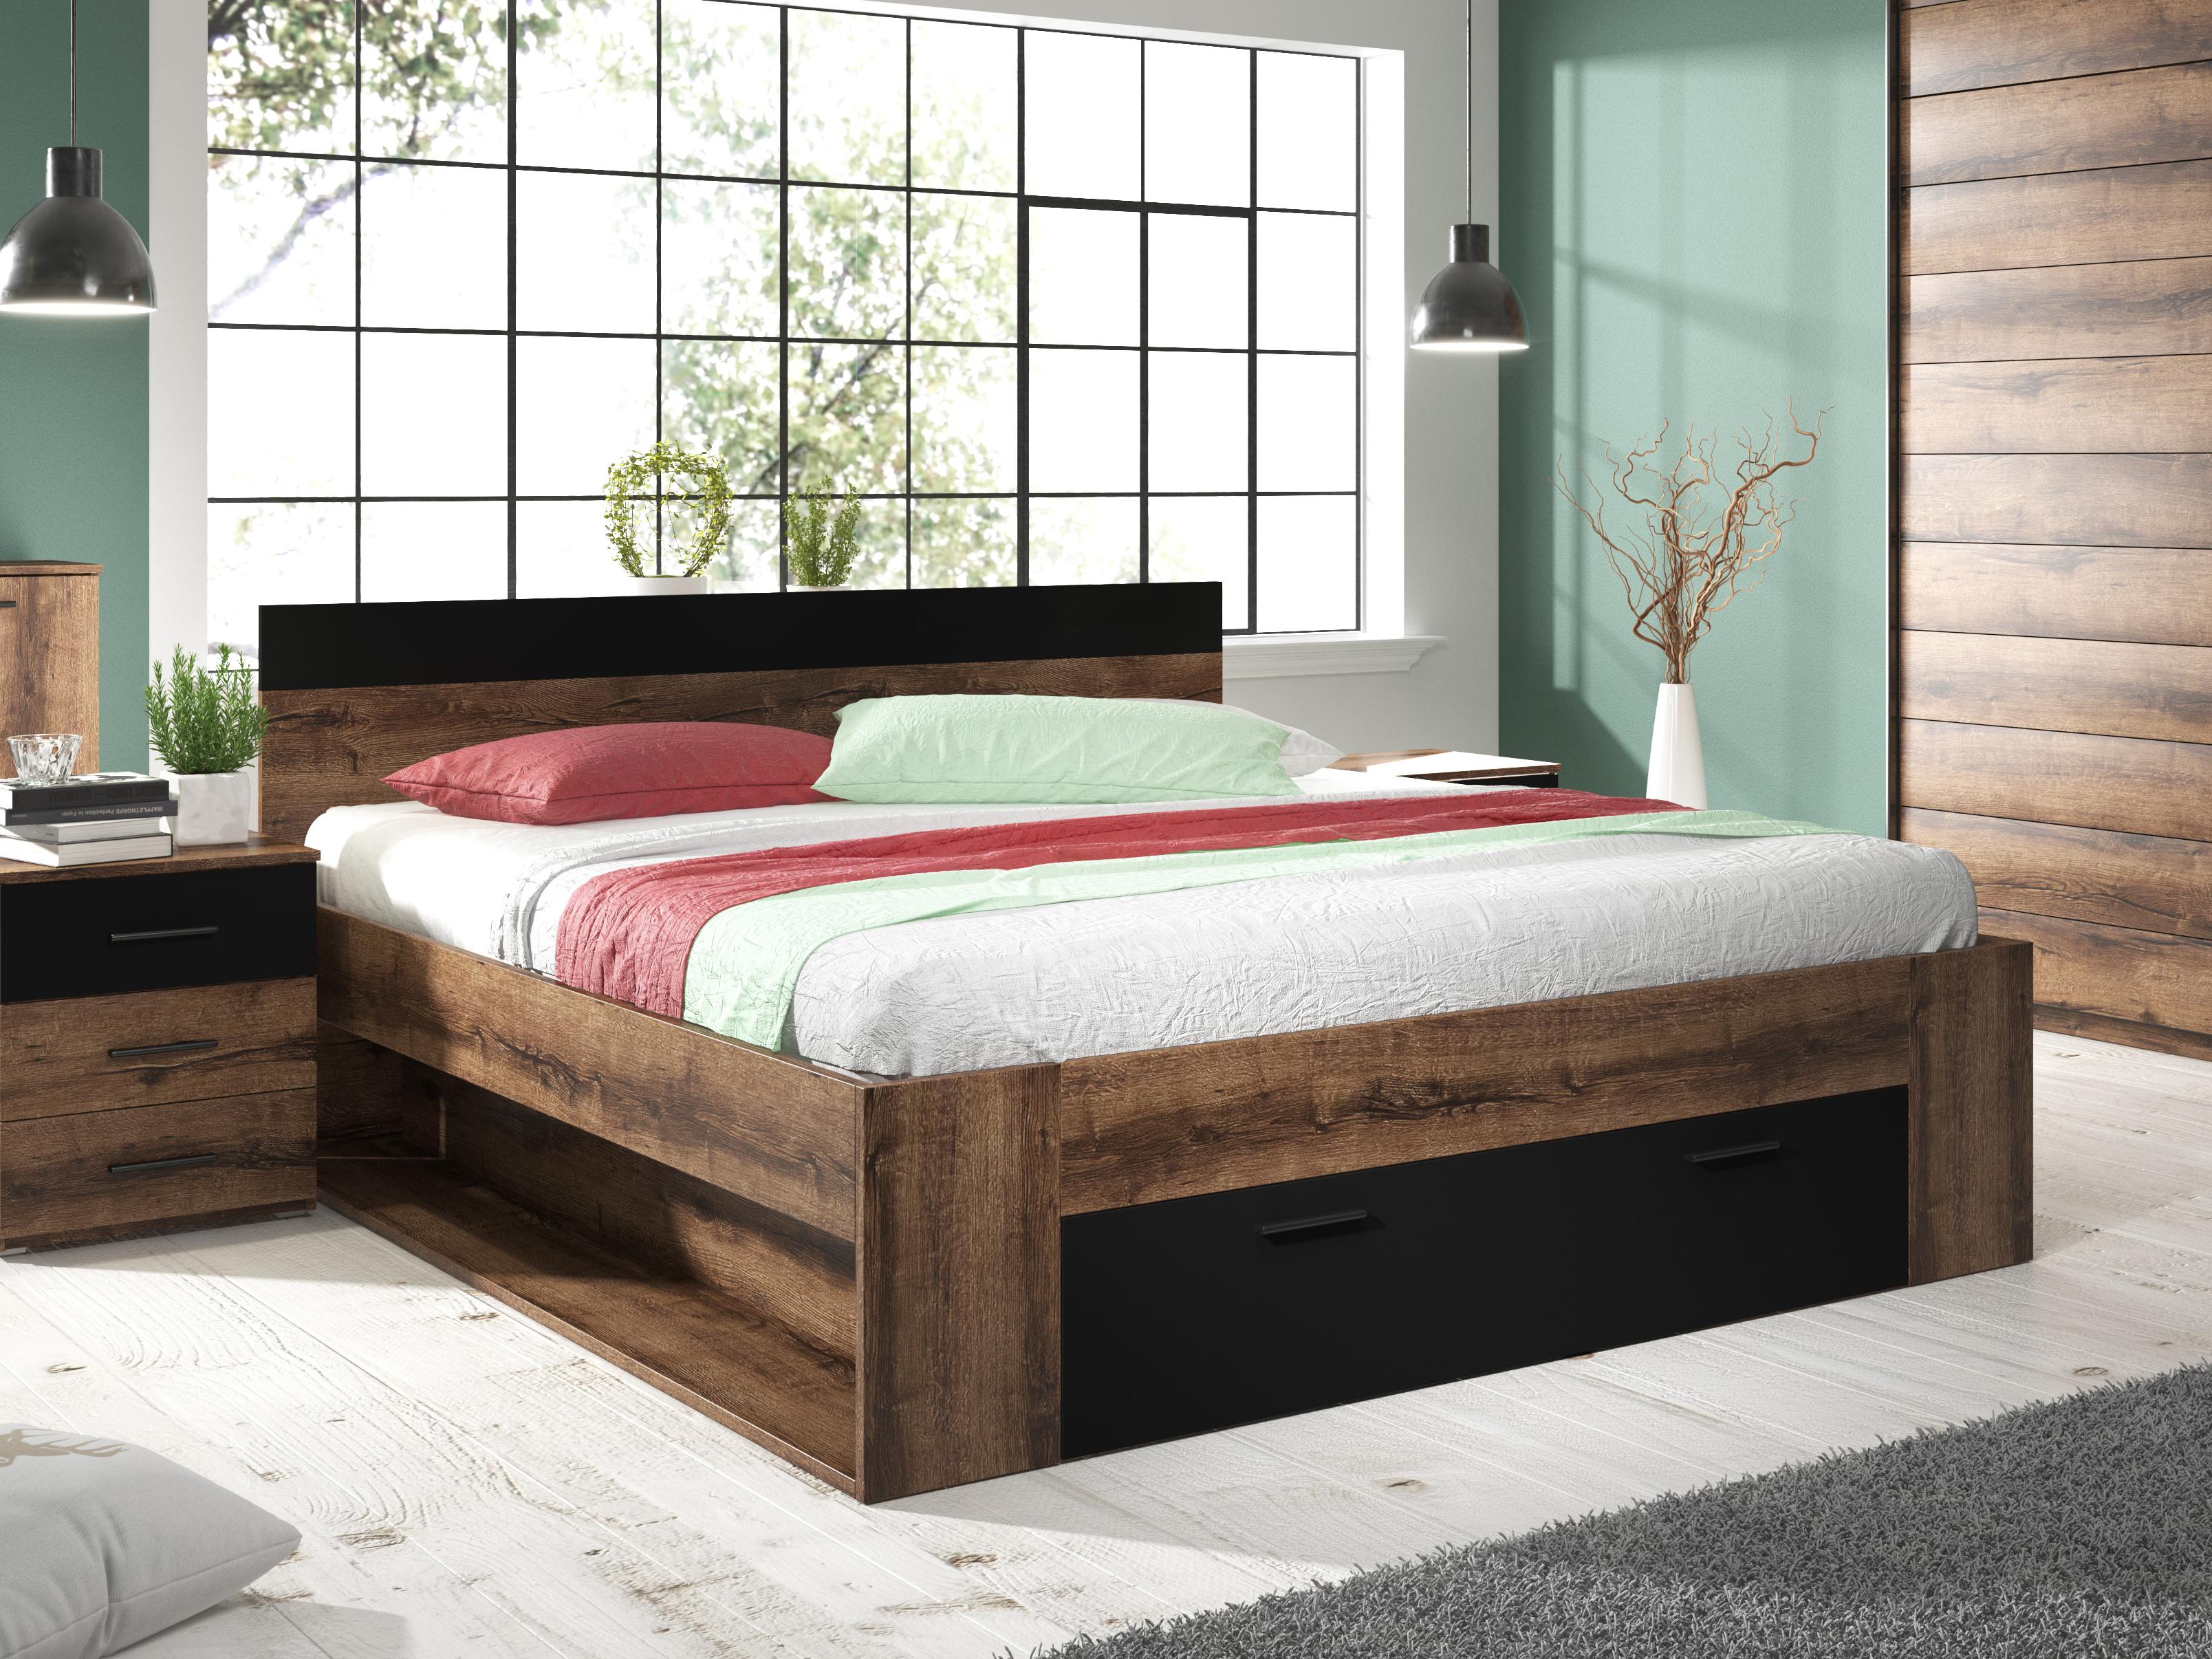 Manželská postel 160 cm - Benson - Typ 91 (dub monastery + černá)